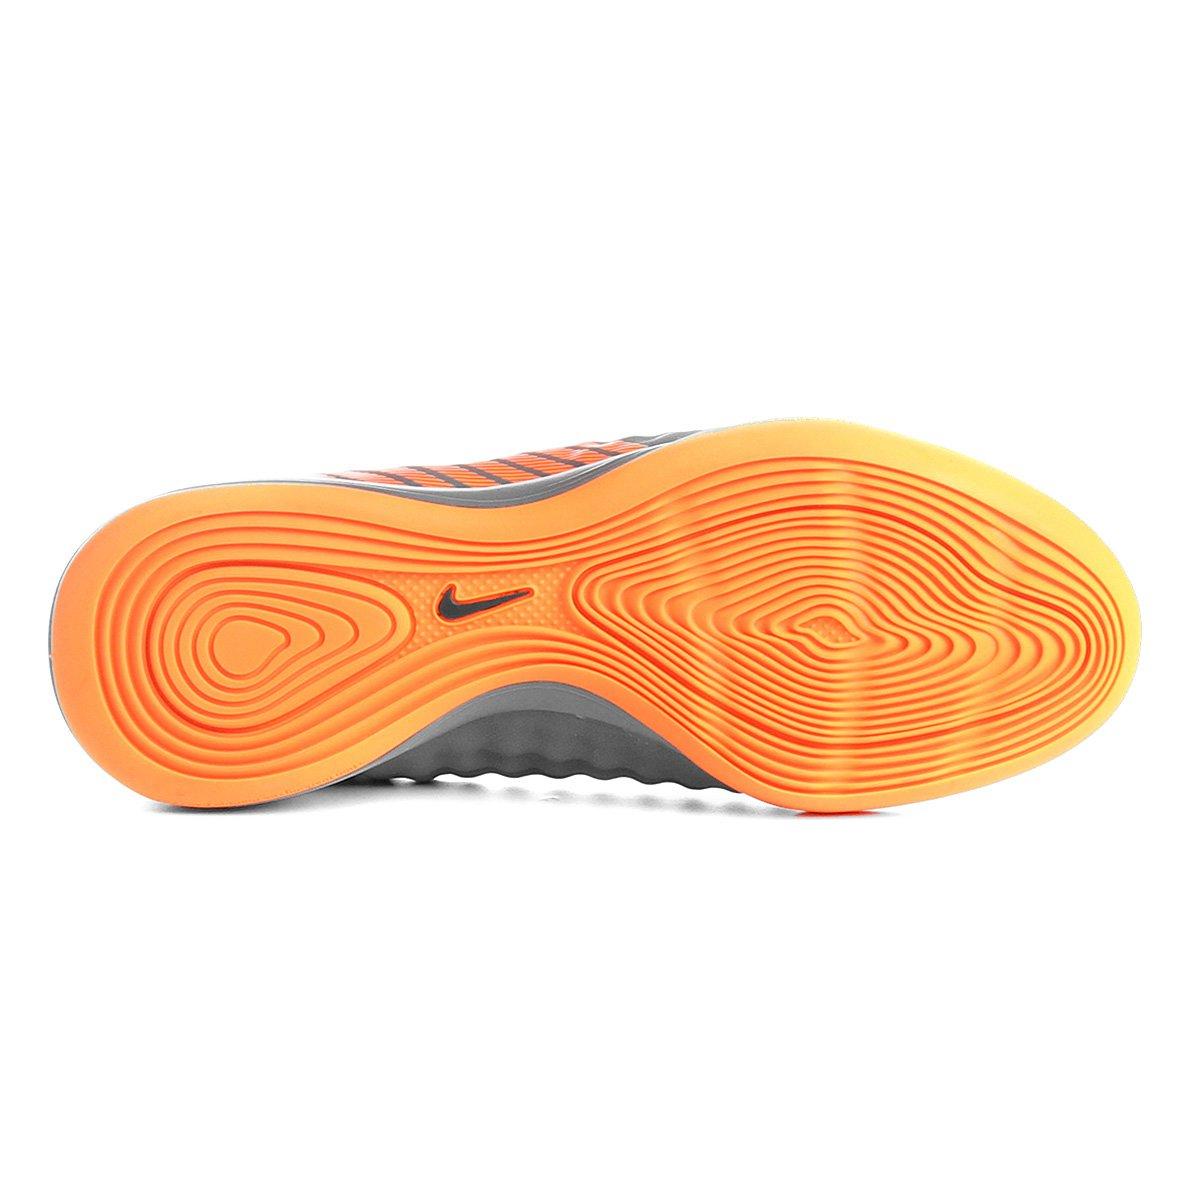 Fit Masculina e Obra Academy Cinza Preto Futsal Nike Dinamic 2 Chuteira Magista tOx08qwnv